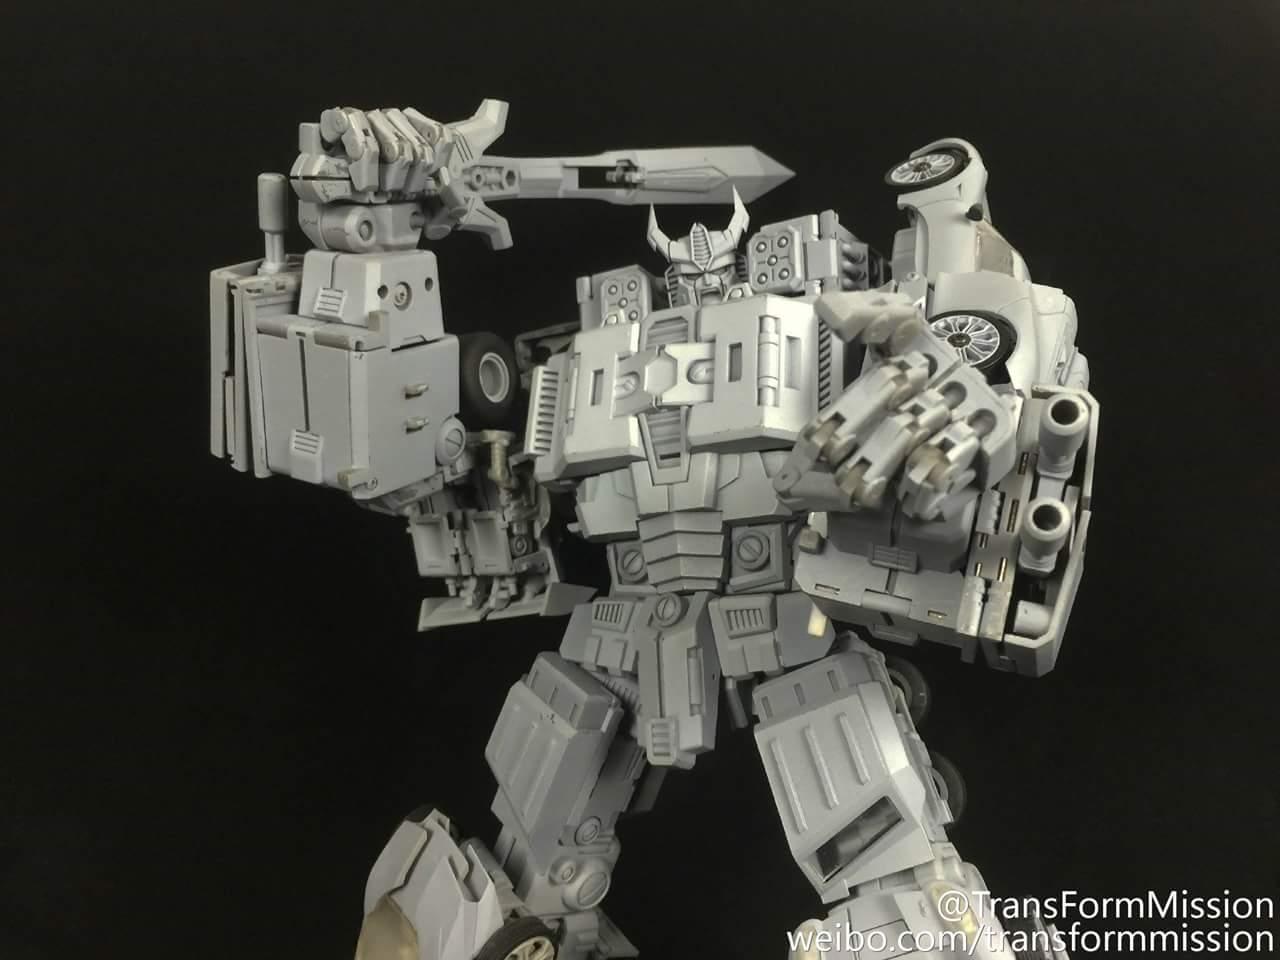 [Transform Mission] Produit Tiers - Jouet M-01 AutoSamurai - aka Menasor/Menaseur des BD IDW NdvcX5Wb